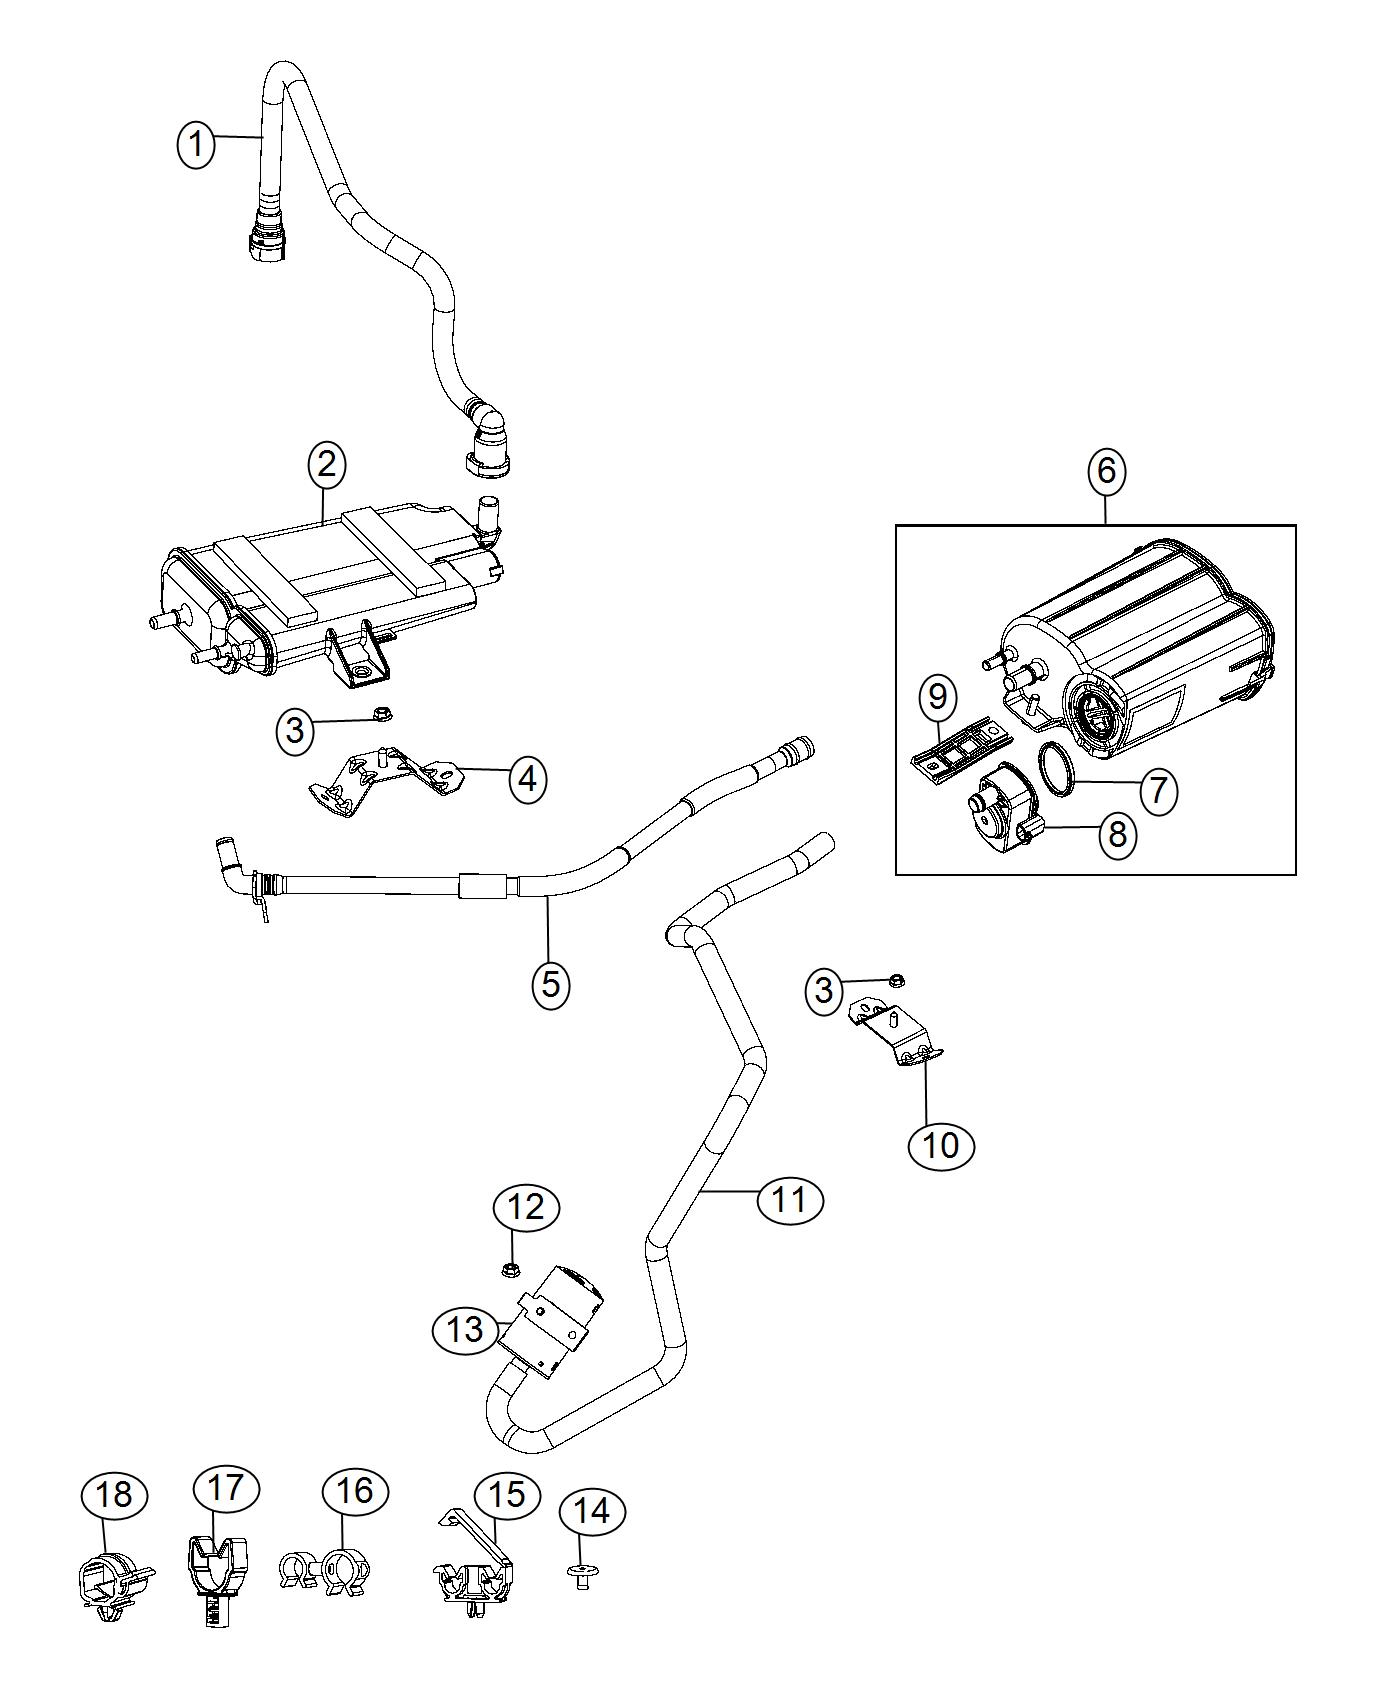 Fiat 500 Canister. Vapor. Pump, leak, detection, vacuum